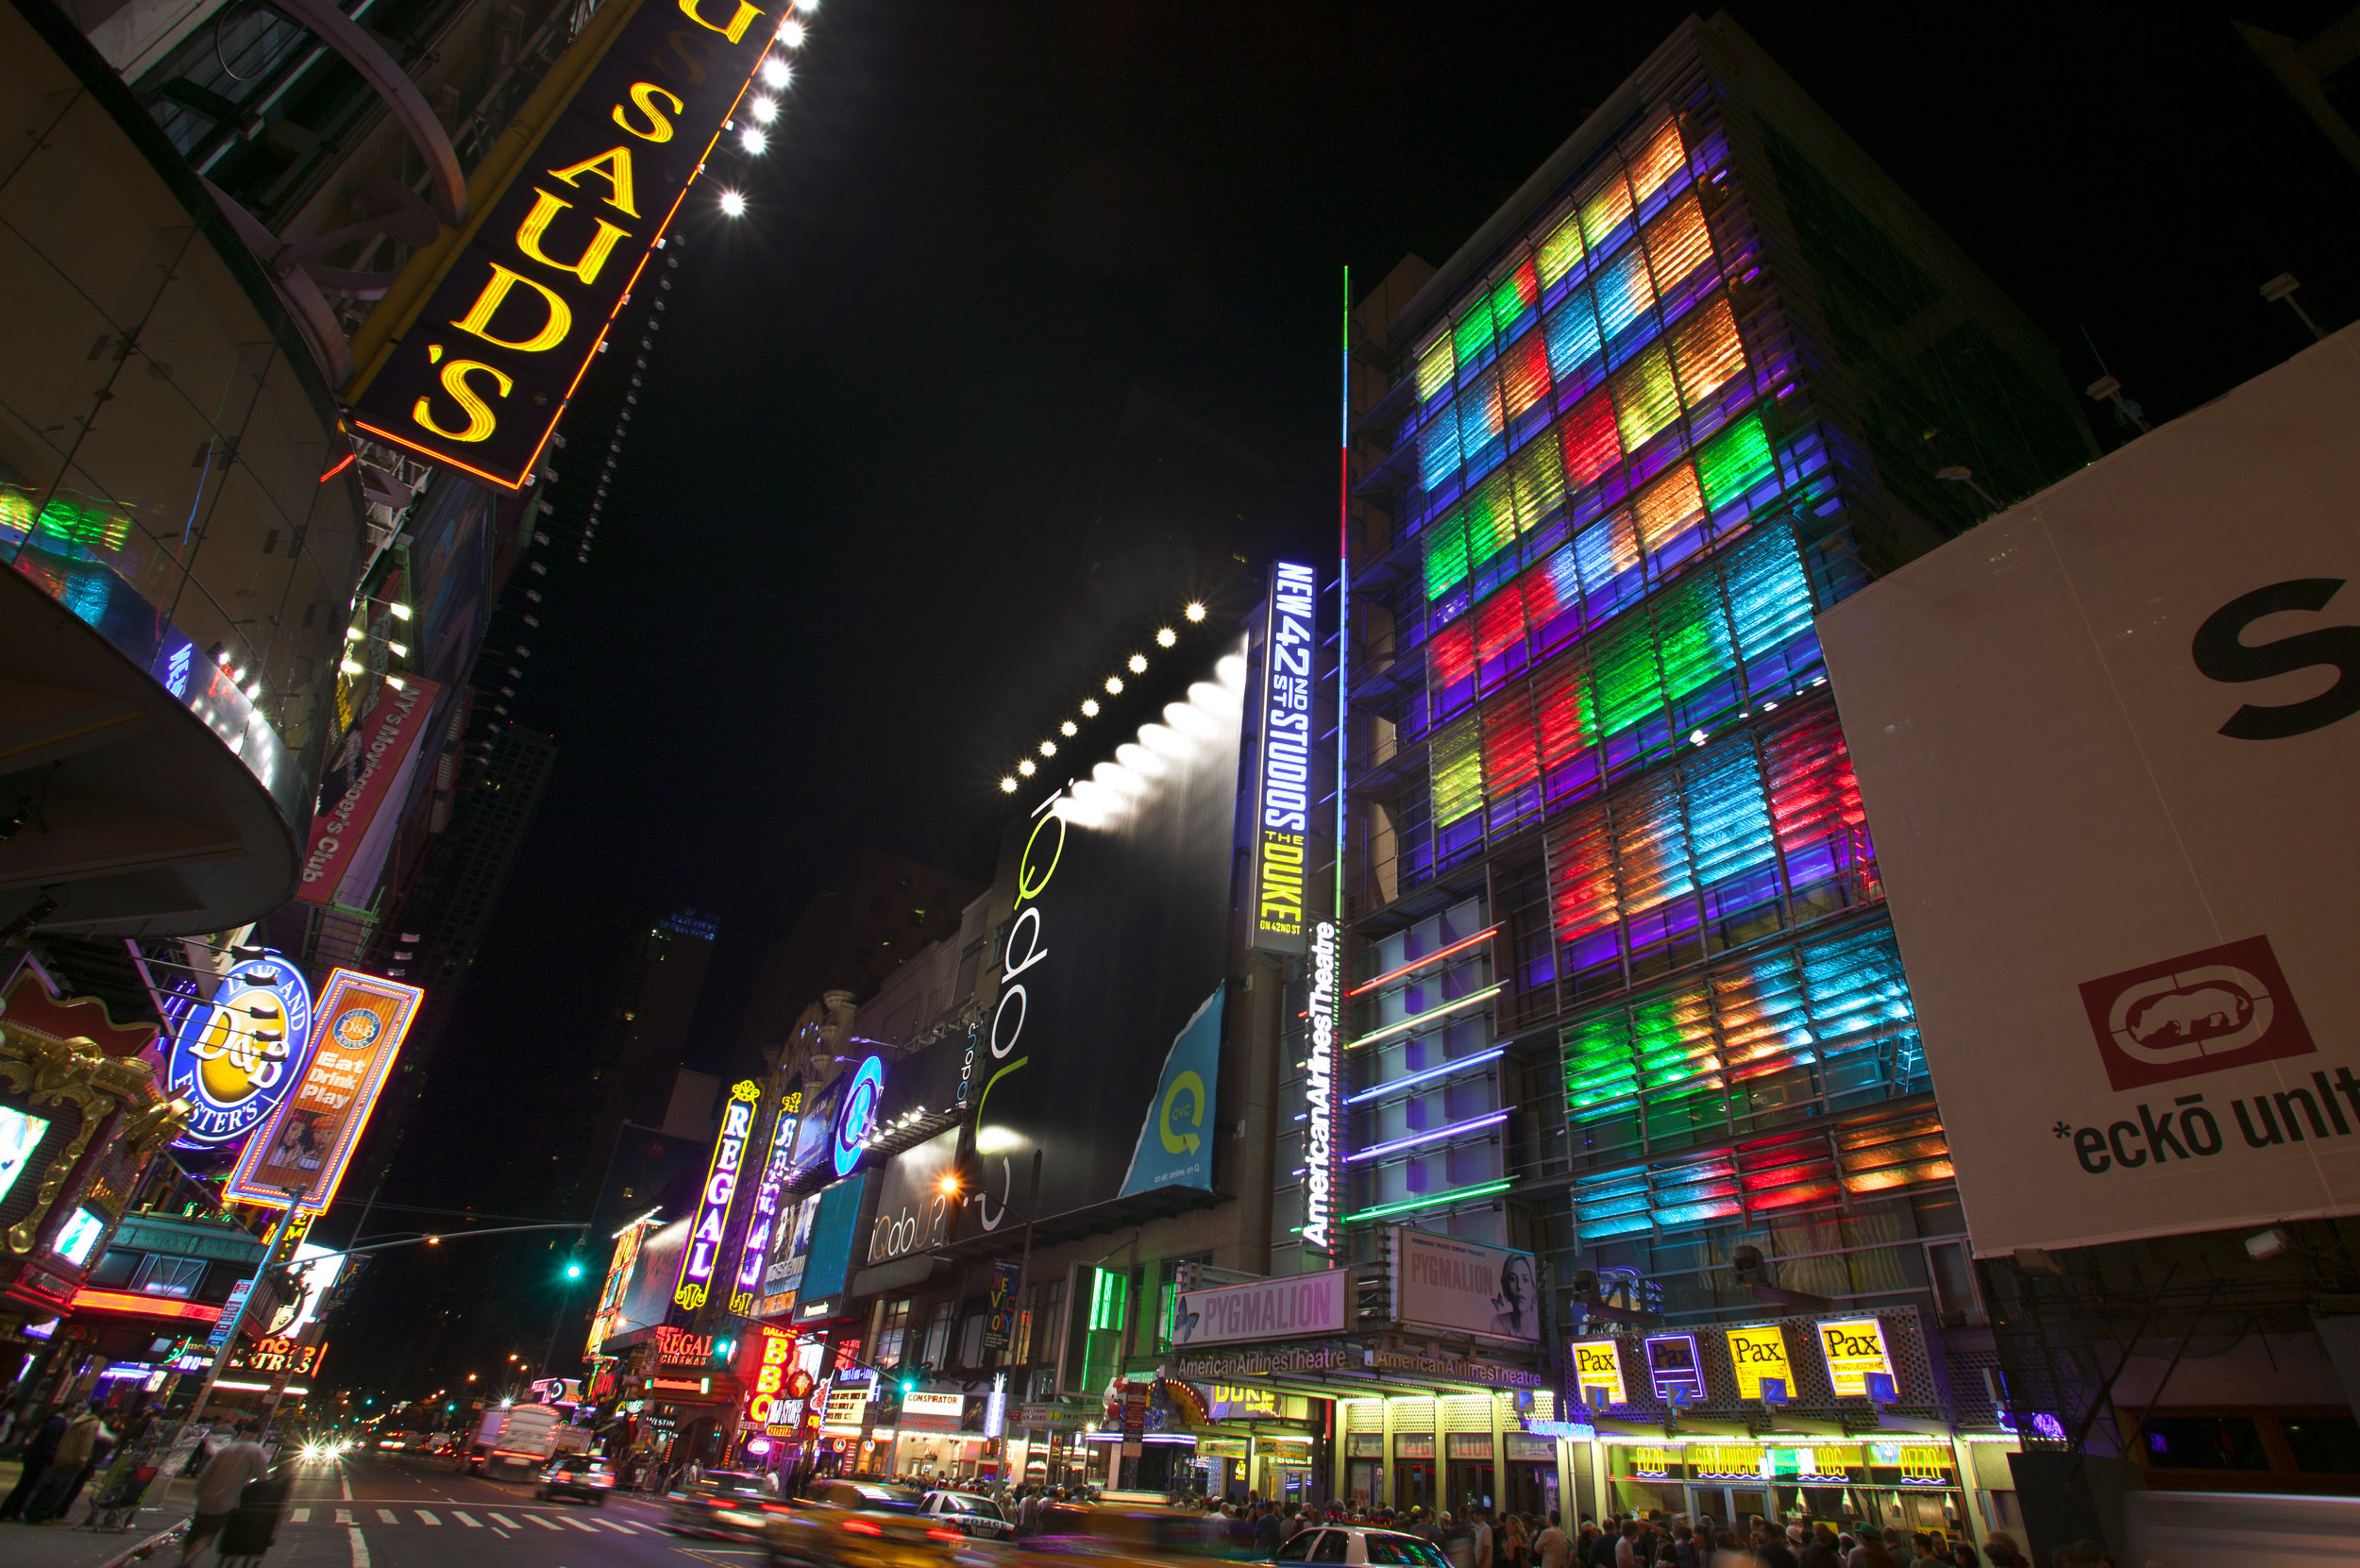 NEW 42ND STREET STUDIOS -